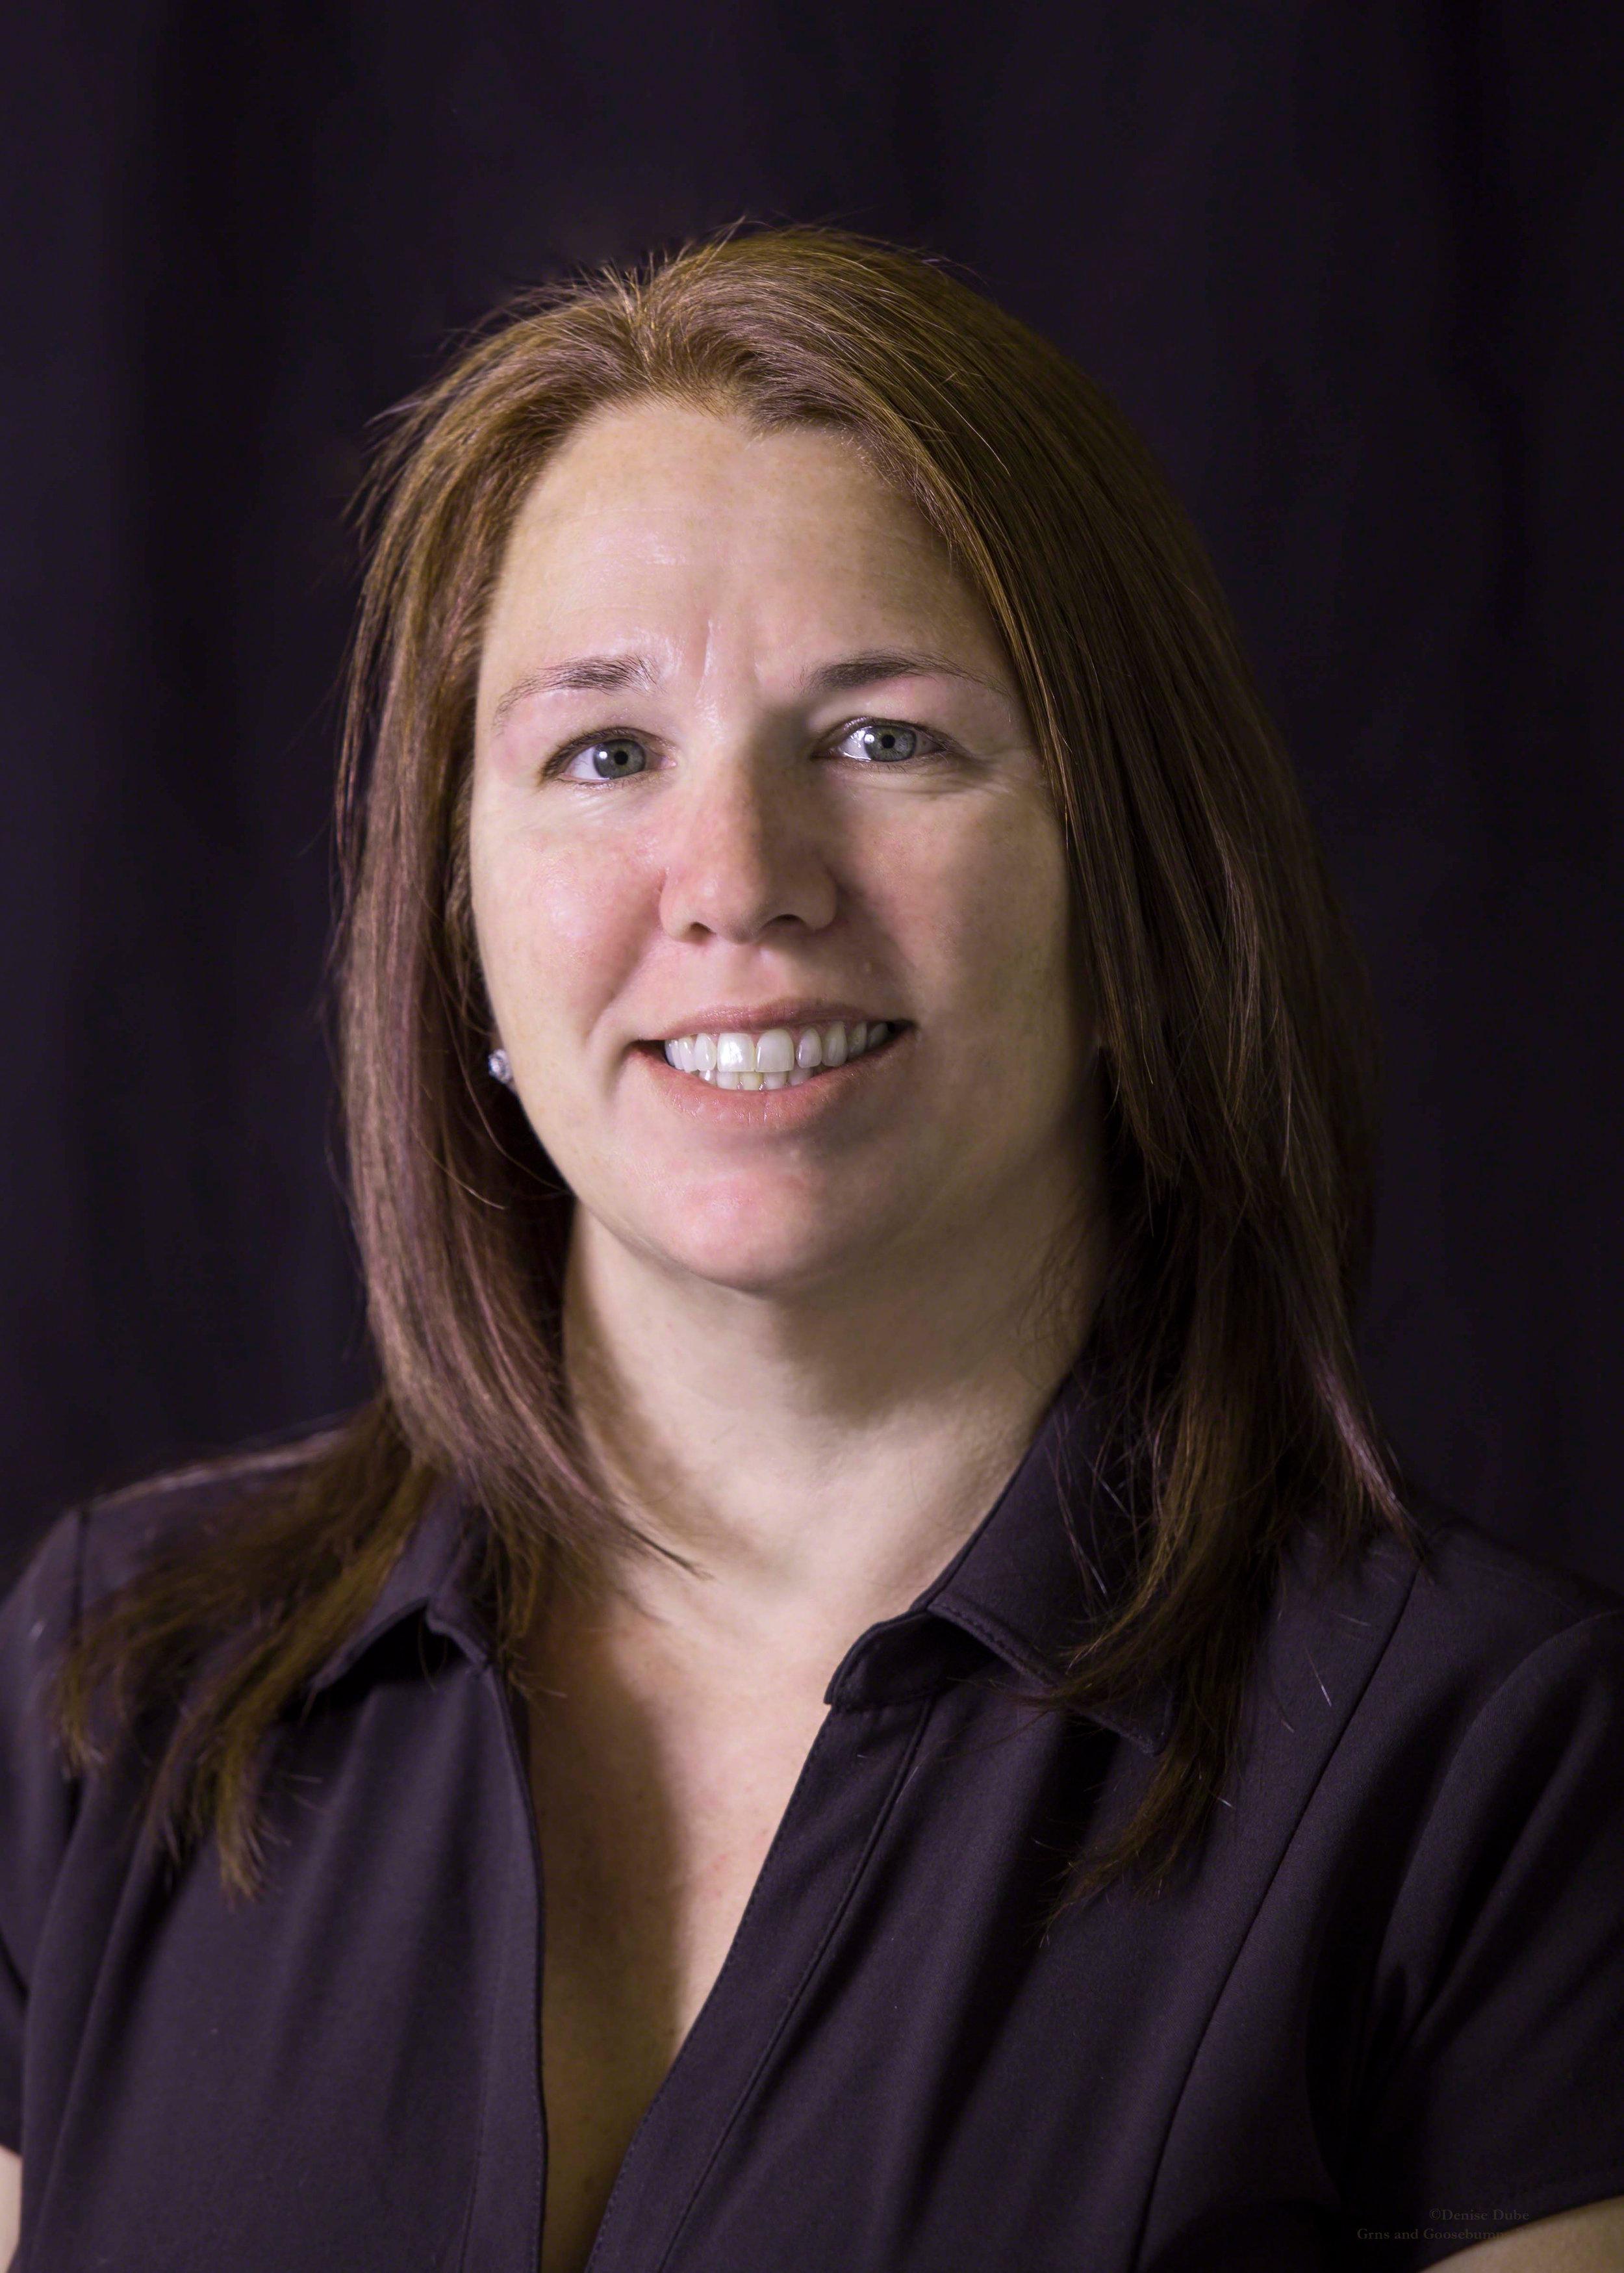 Susan Wyant